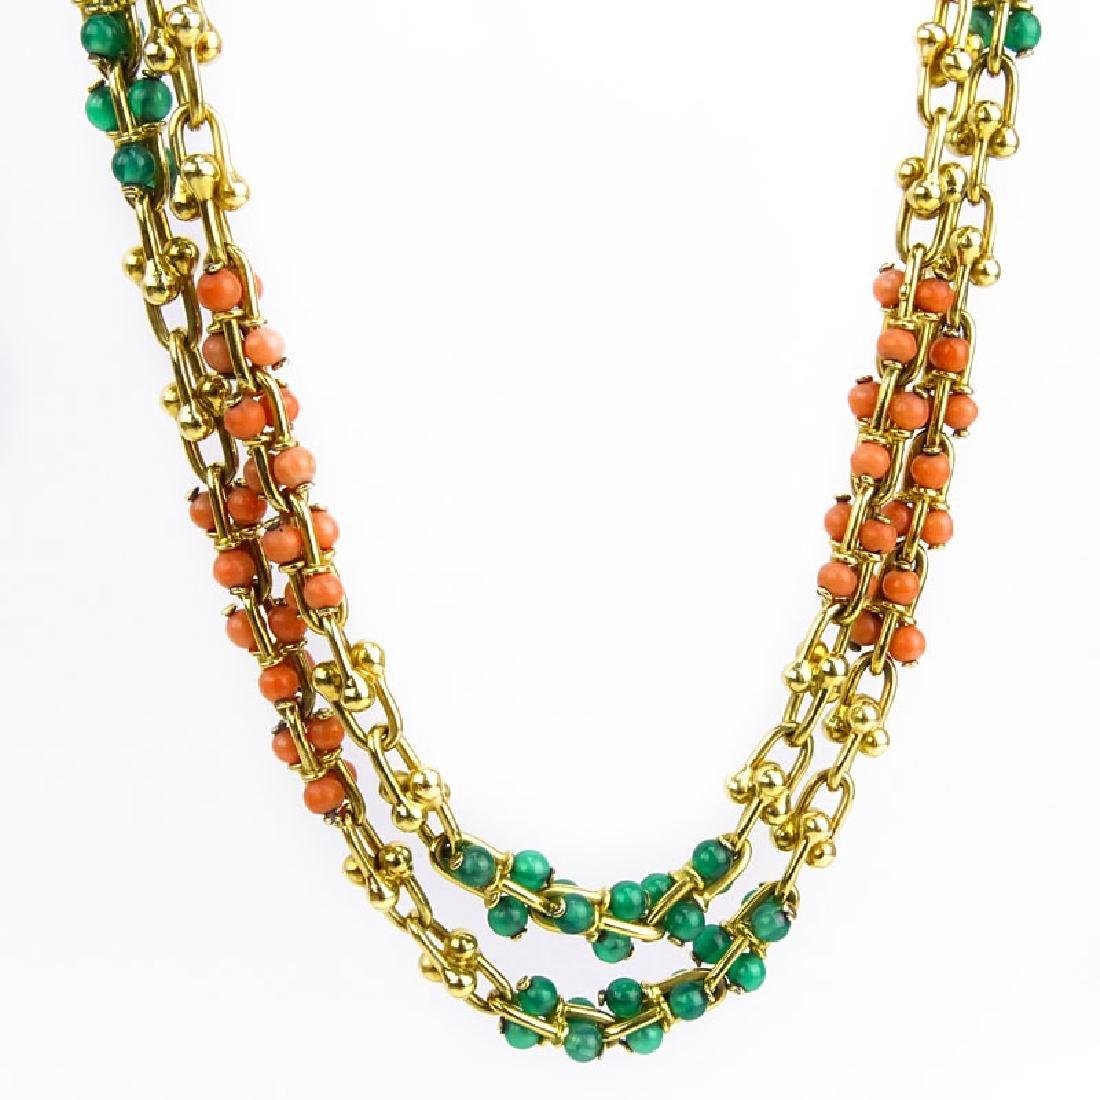 Vintage Bulgari 18 Karat Yellow Gold Link Necklace with